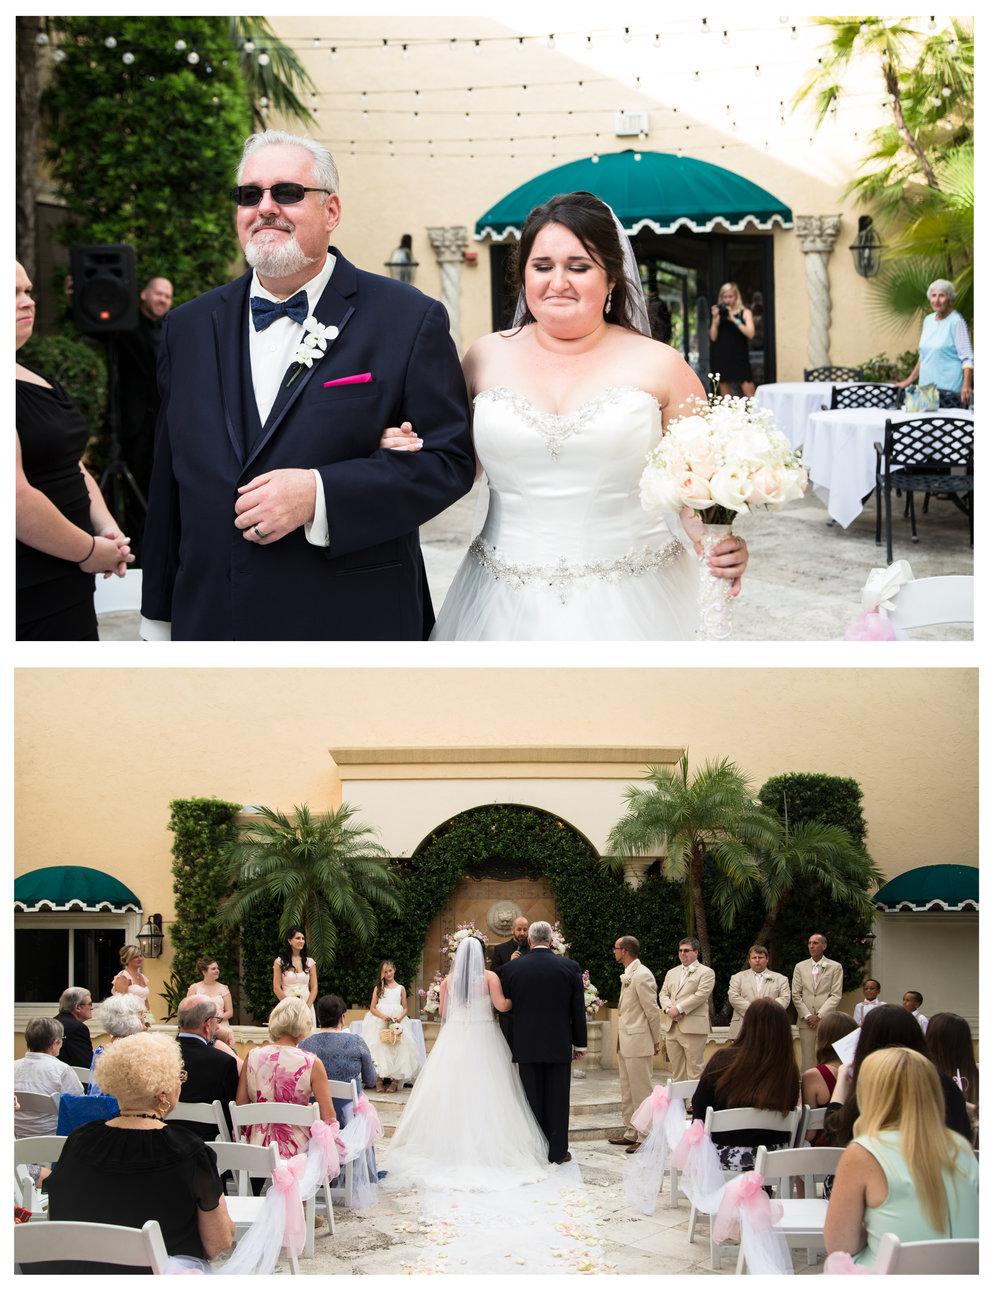 Benvenuto_Boynton Beach_ Wedding_Emily_&_Shawn 15.jpg